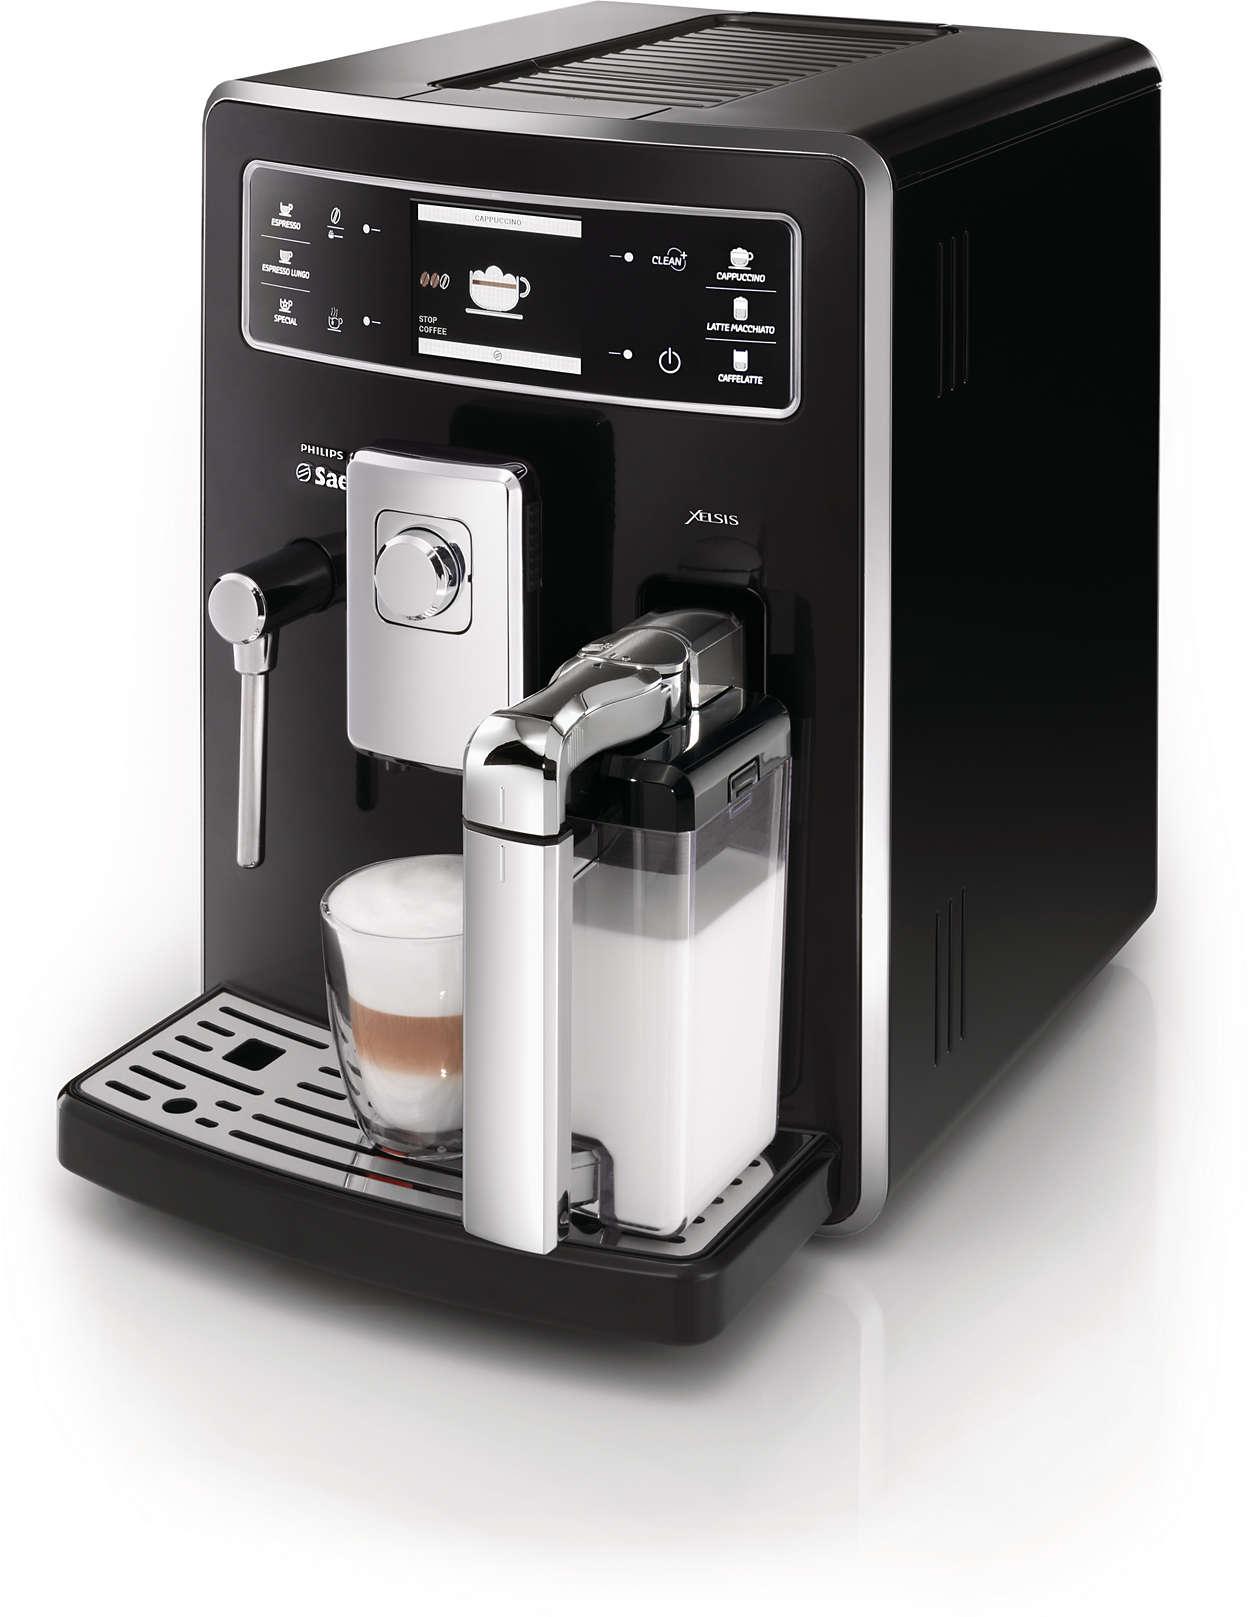 xelsis kaffeevollautomat hd8943 11 saeco. Black Bedroom Furniture Sets. Home Design Ideas